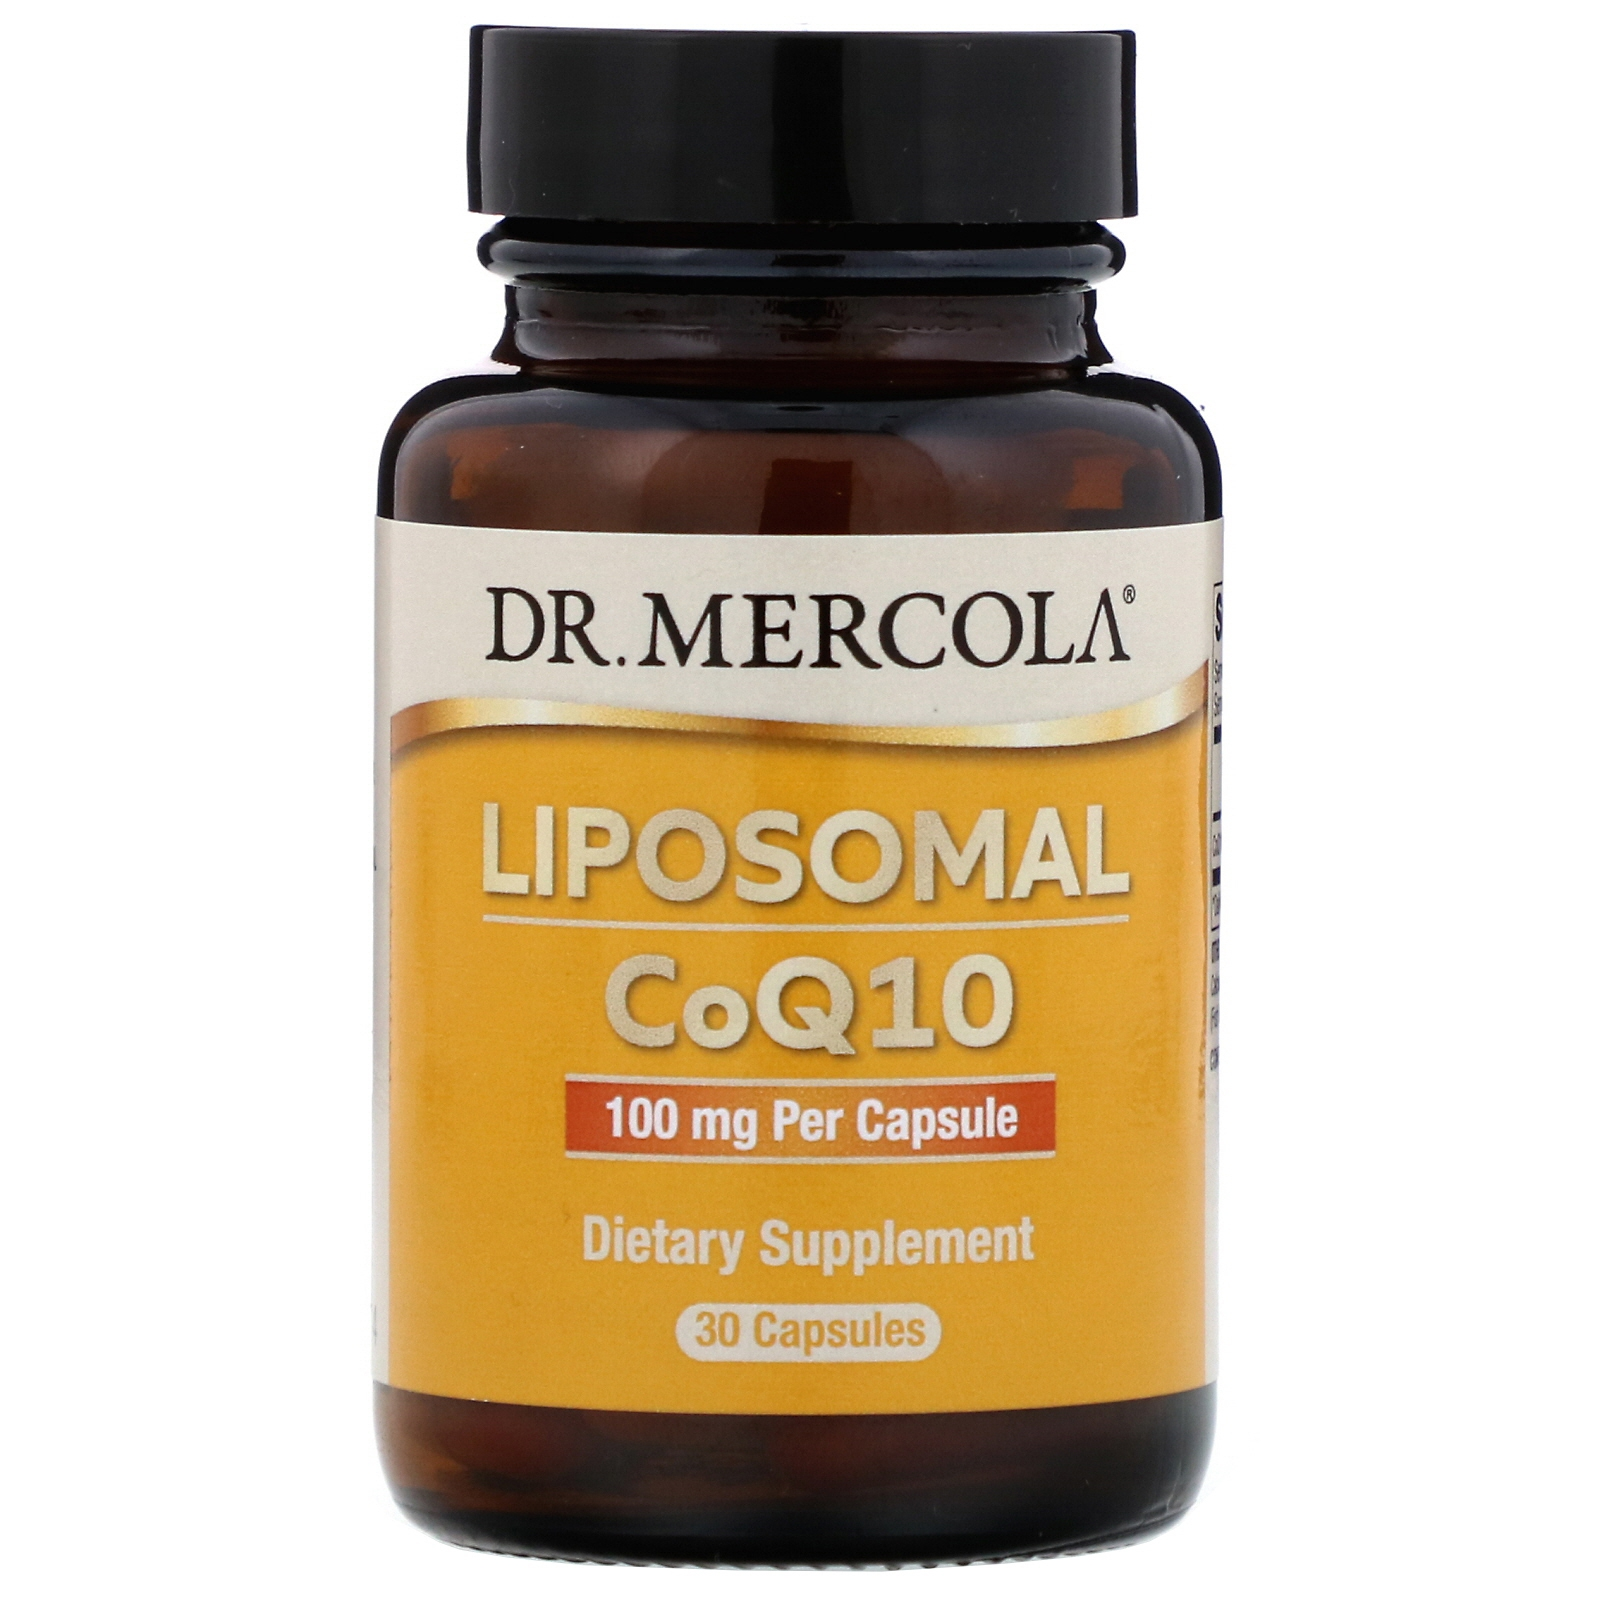 Image of CoQ10 100 mg (30 Licaps Capsules) - Dr. Mercola 0813006014984